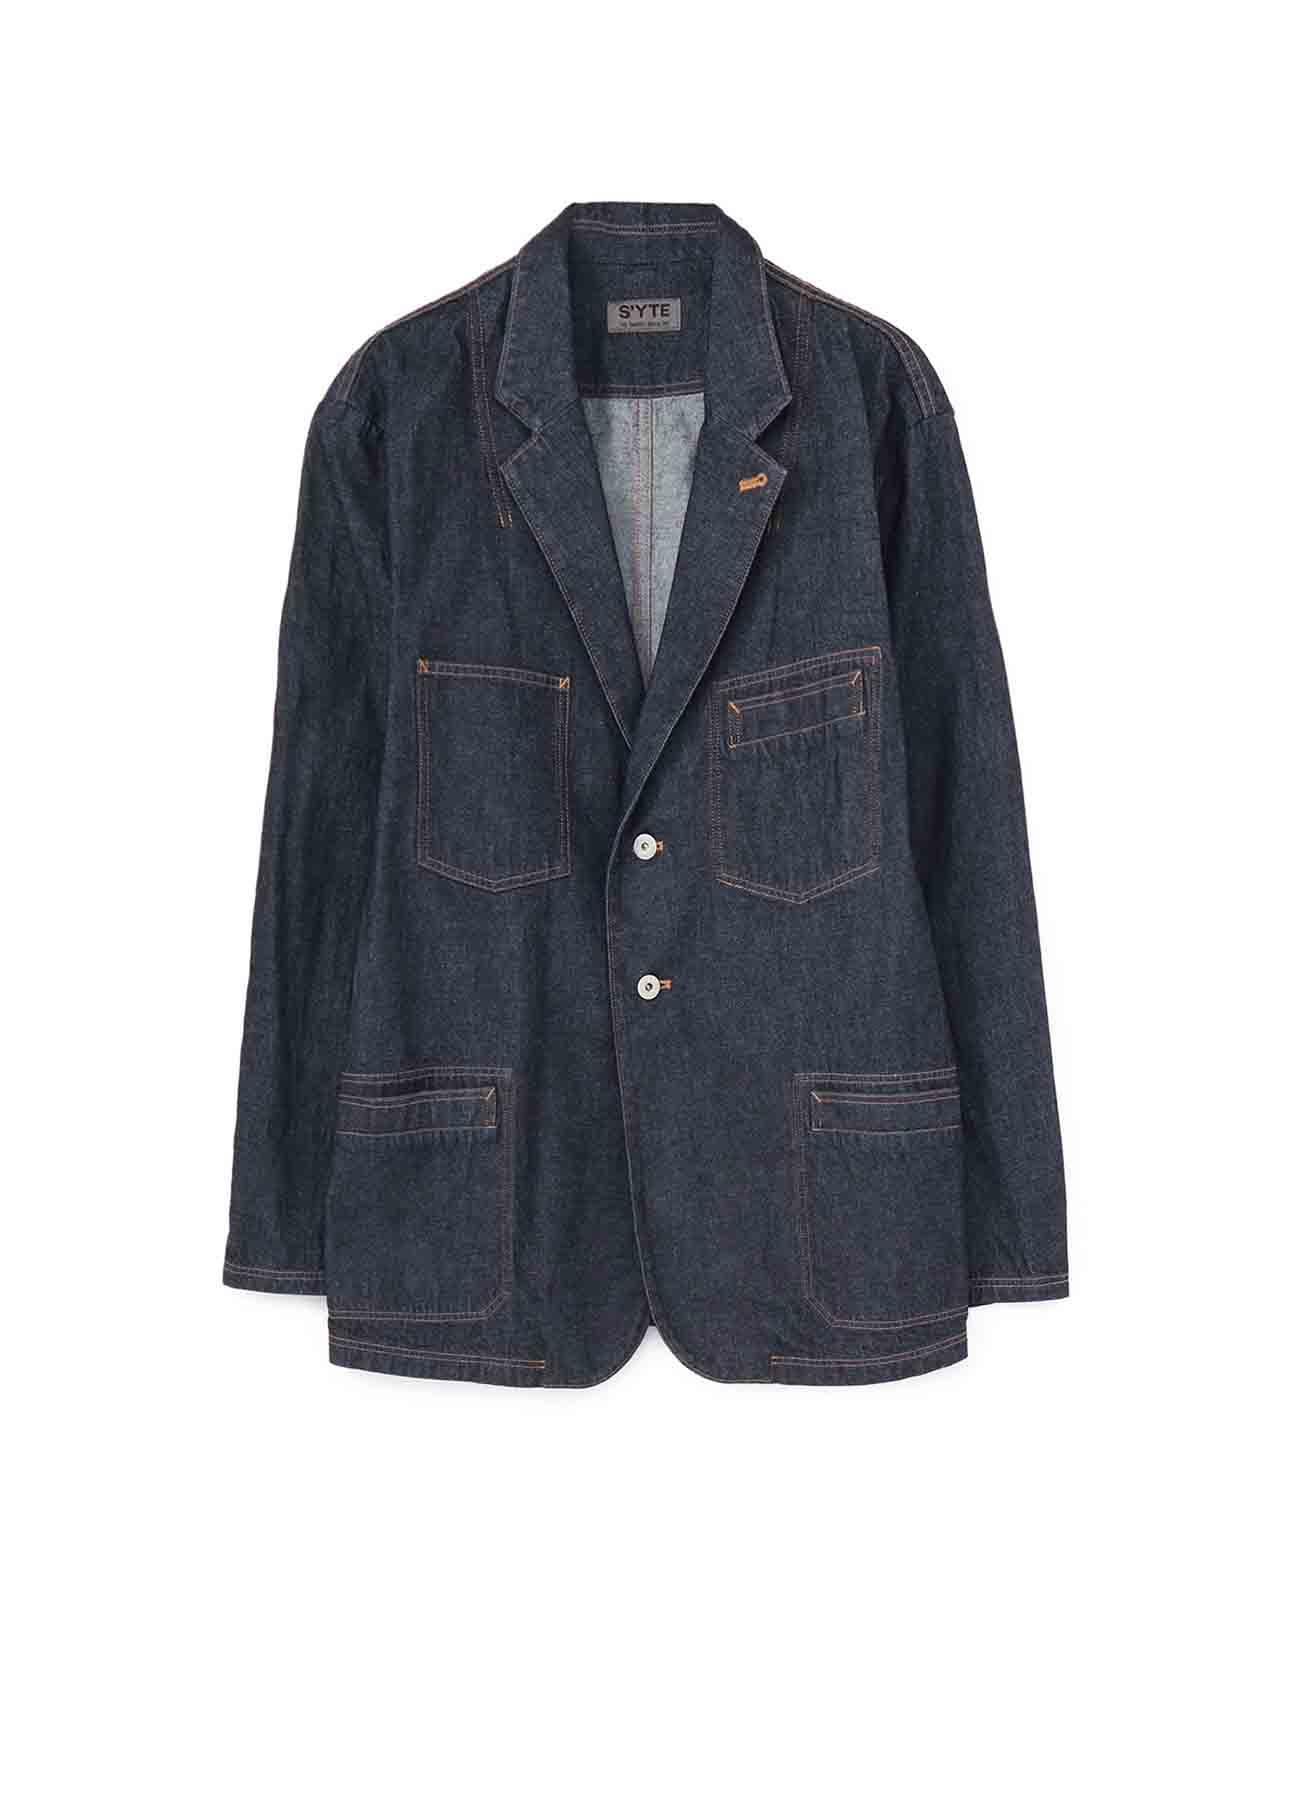 10oz Denim 2BS Tailored Jacket